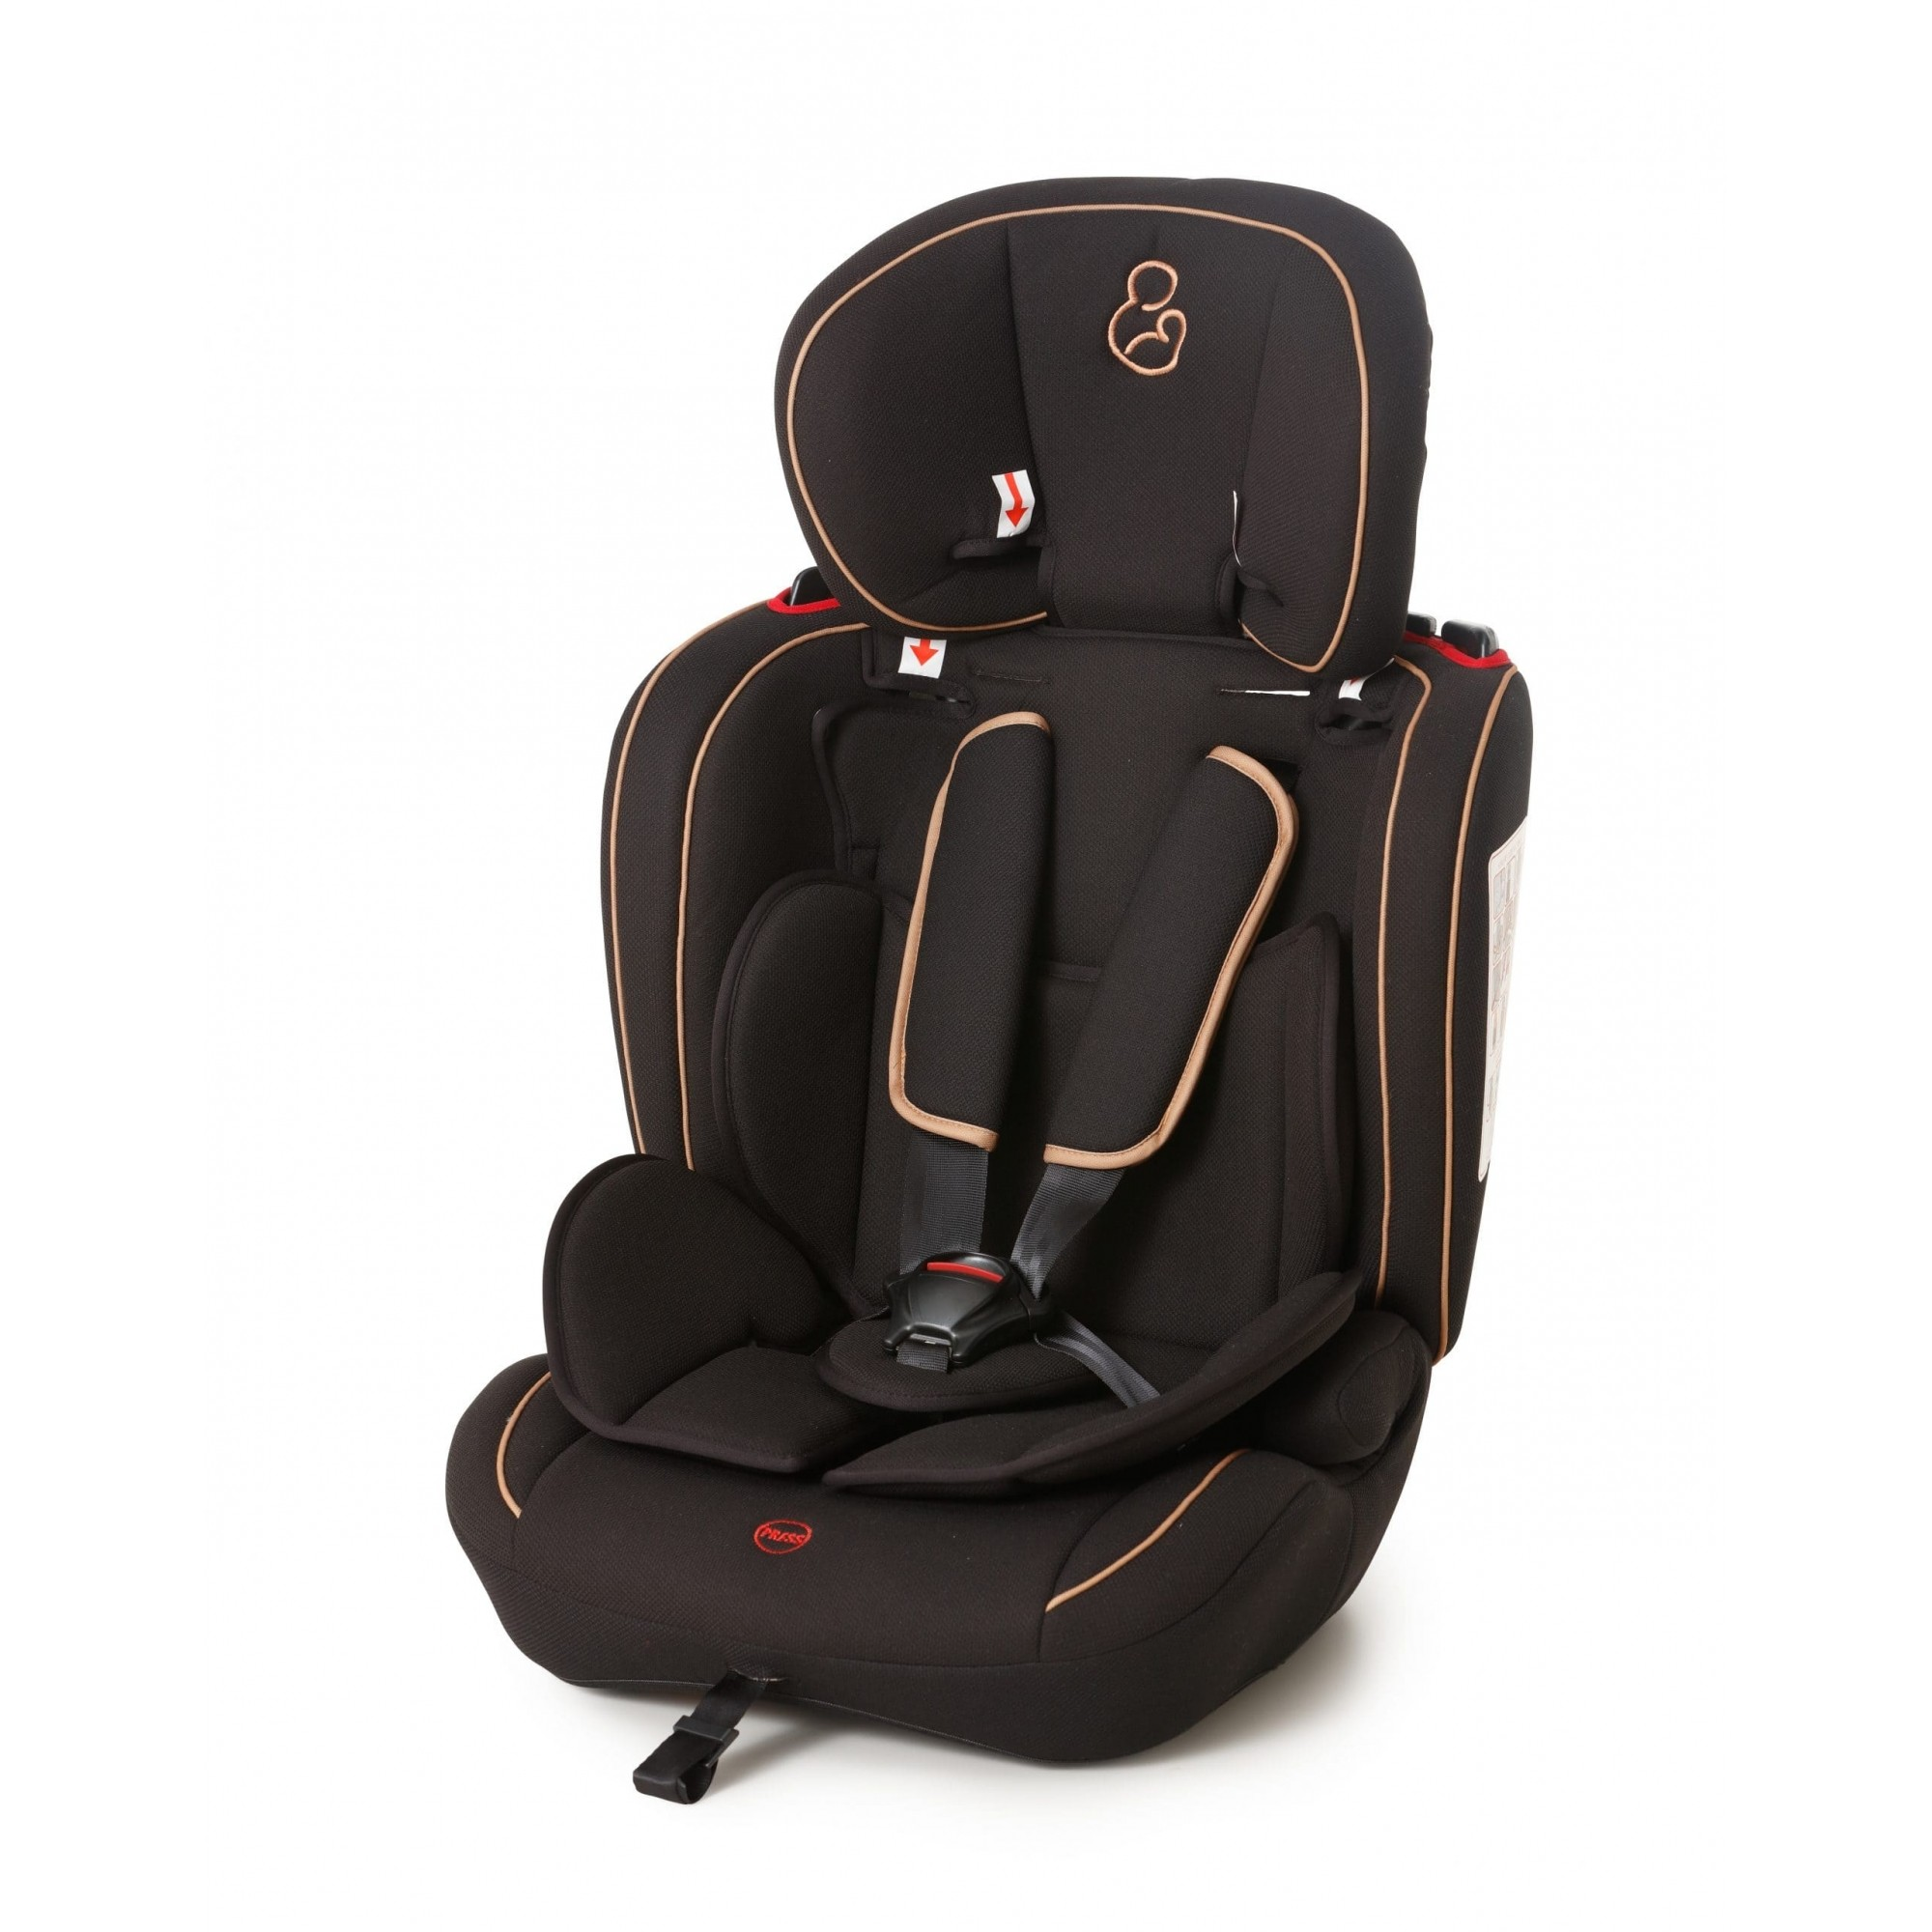 Cadeira para Auto Ravi 8007 Preta Galzerano